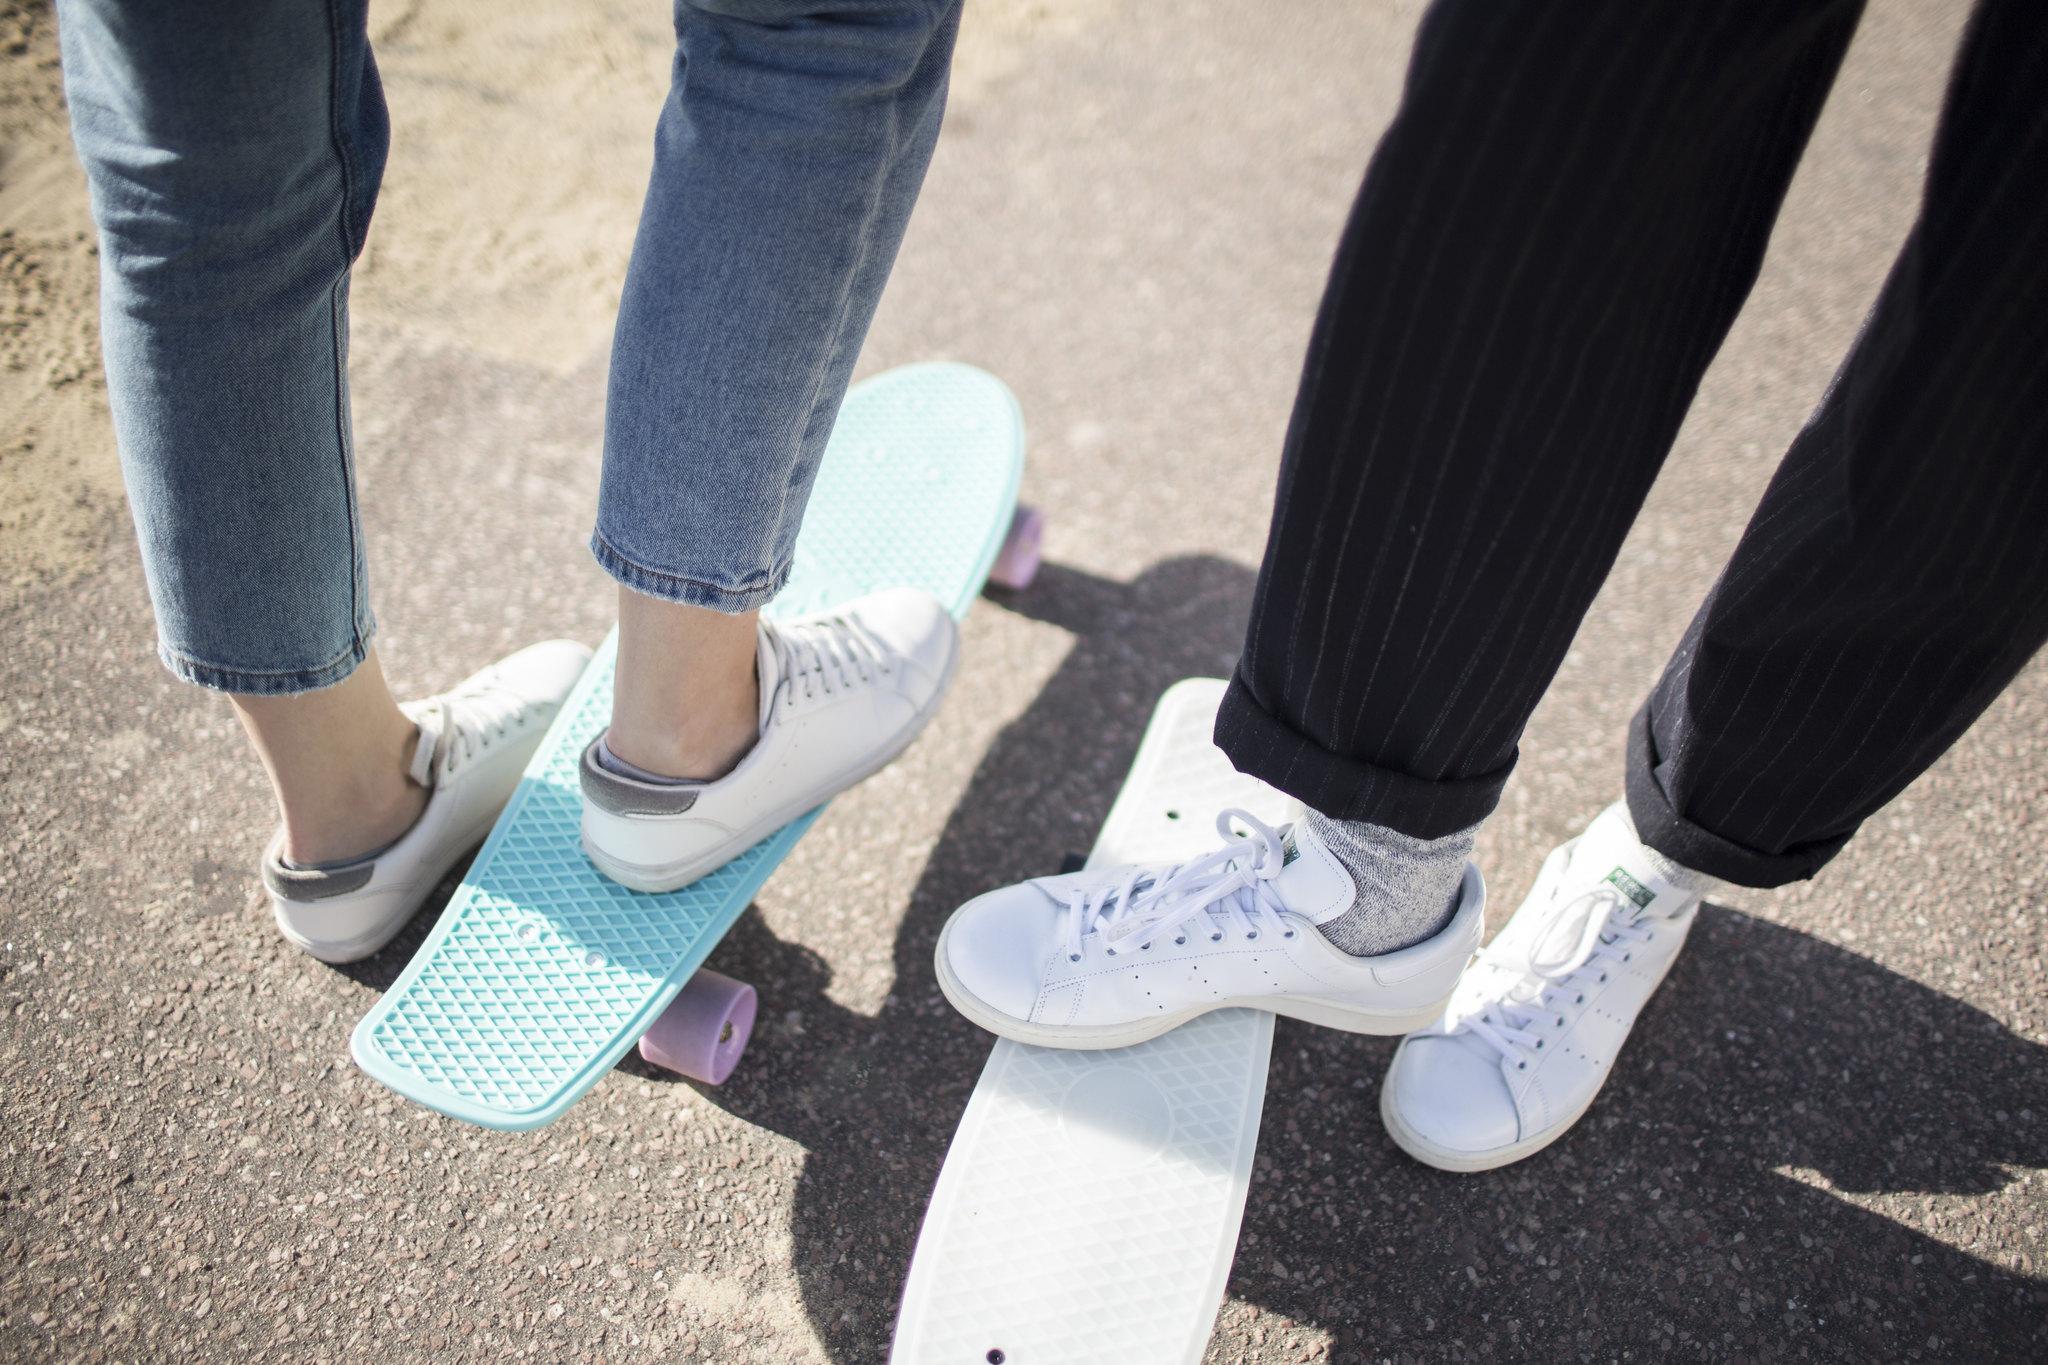 Jordan_Bunker_penny_skateboards_9